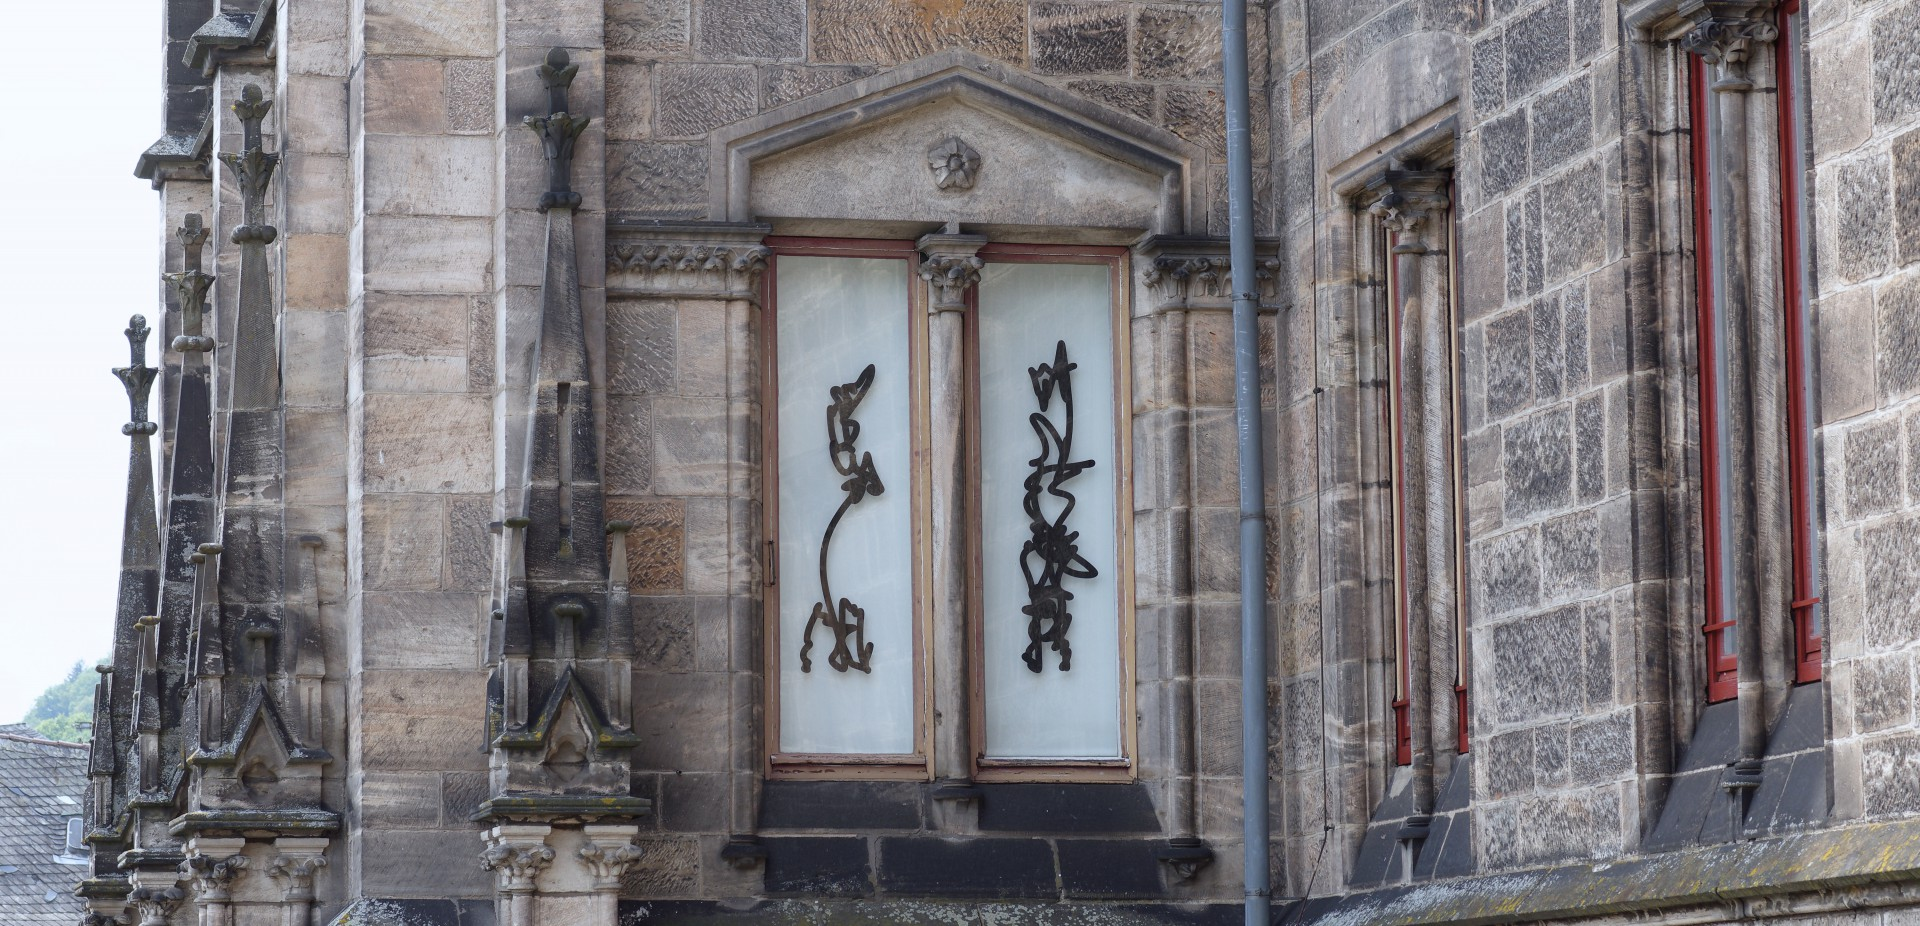 Library of Institut fuer Kirchenbau